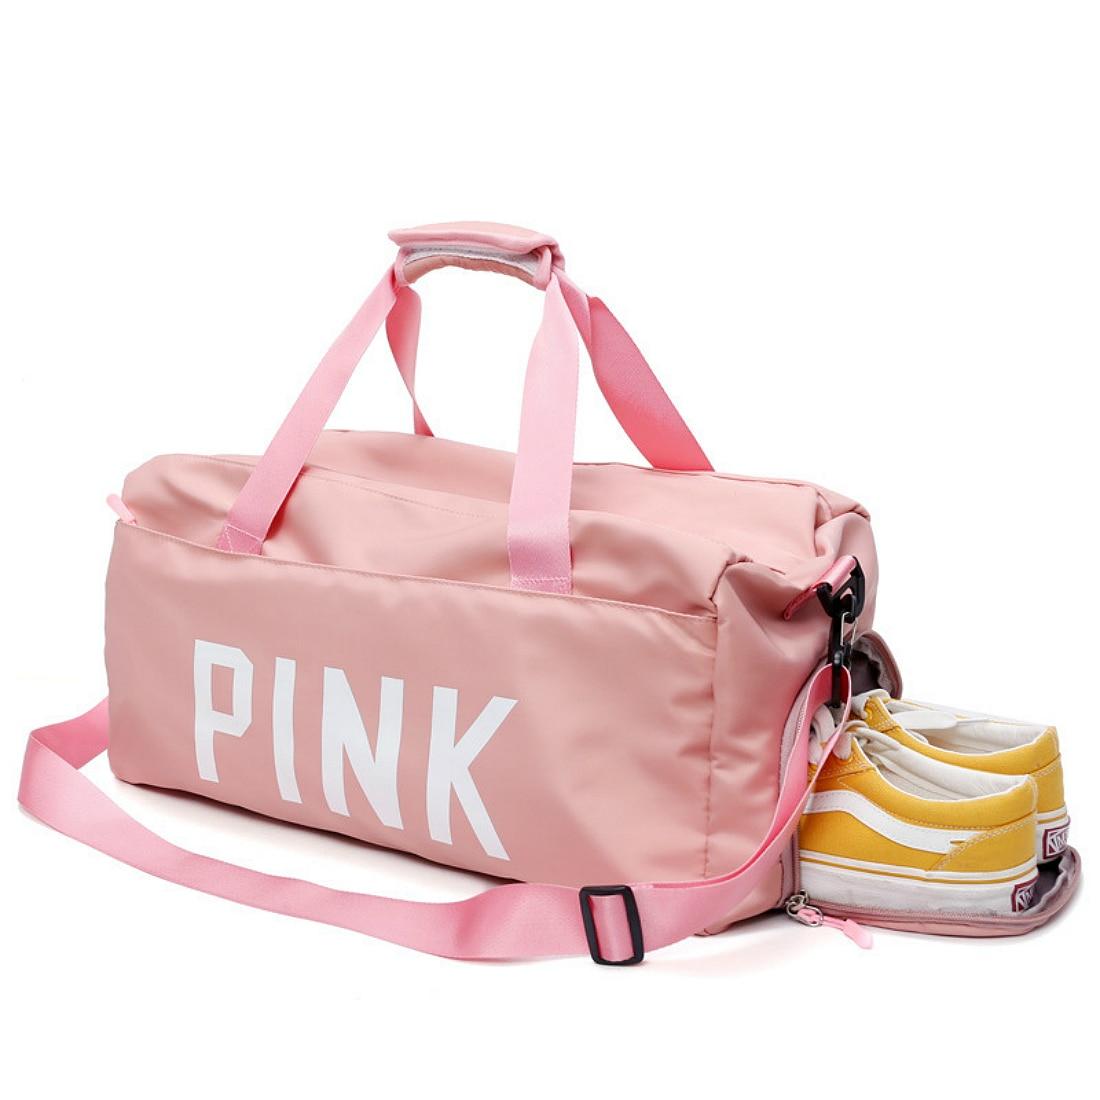 b8156a5e520c 2018 New BLACK Bag Girl Outdoor Sports Bag with Shoes Storage Duffel Bag  Women Gym Yoga